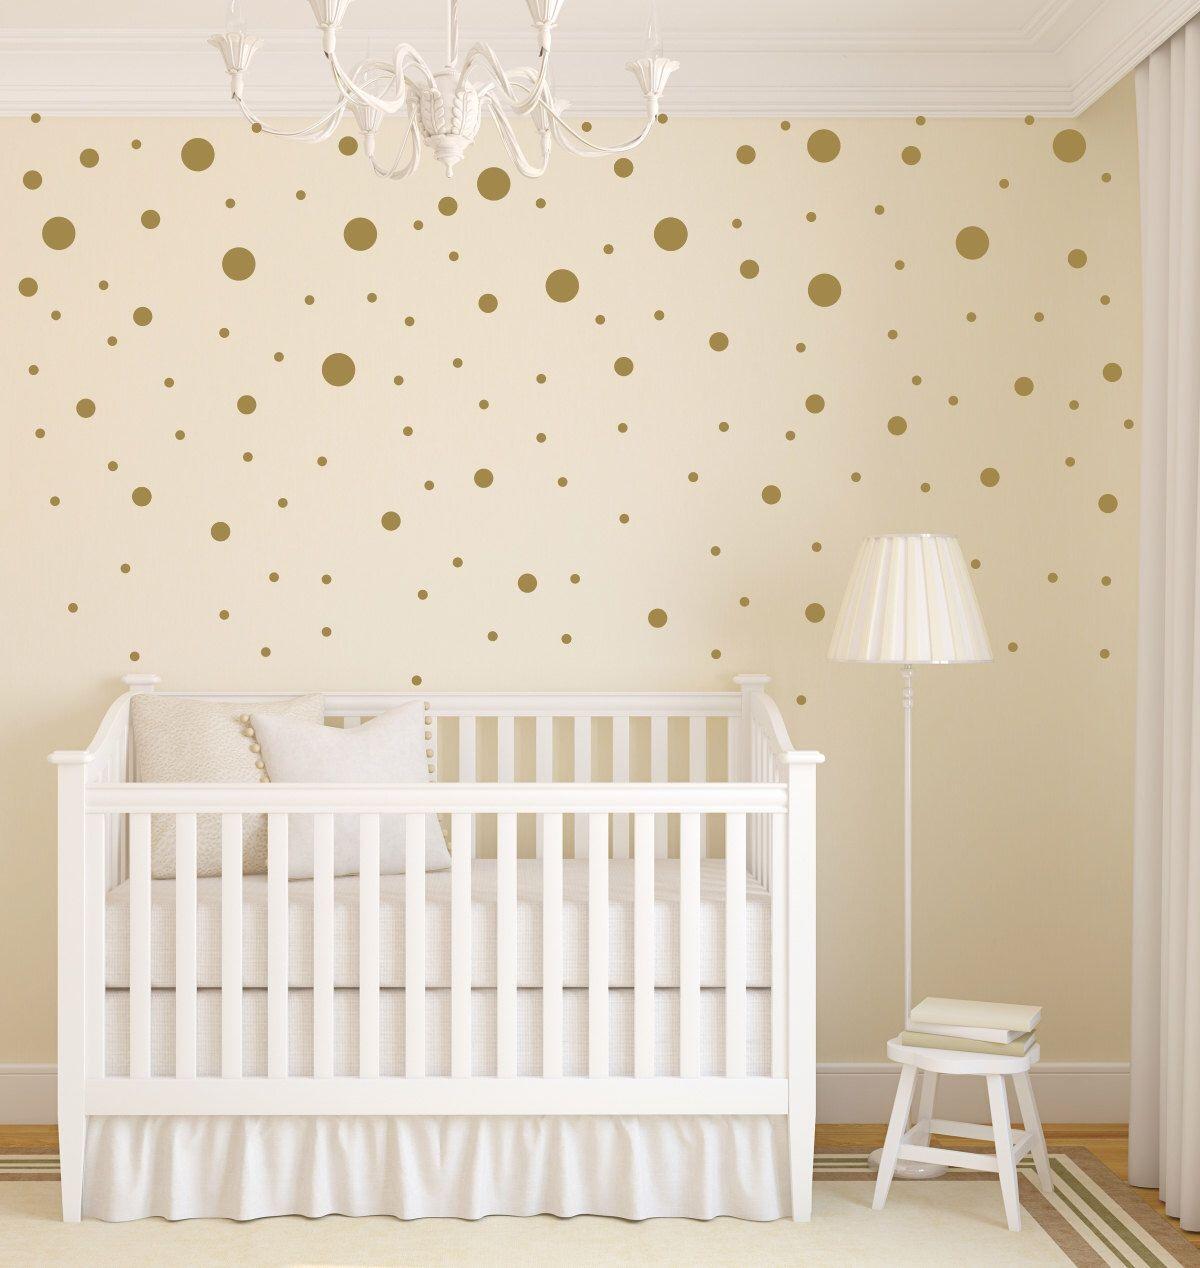 Gold Dot Decals Polka Dot Wall